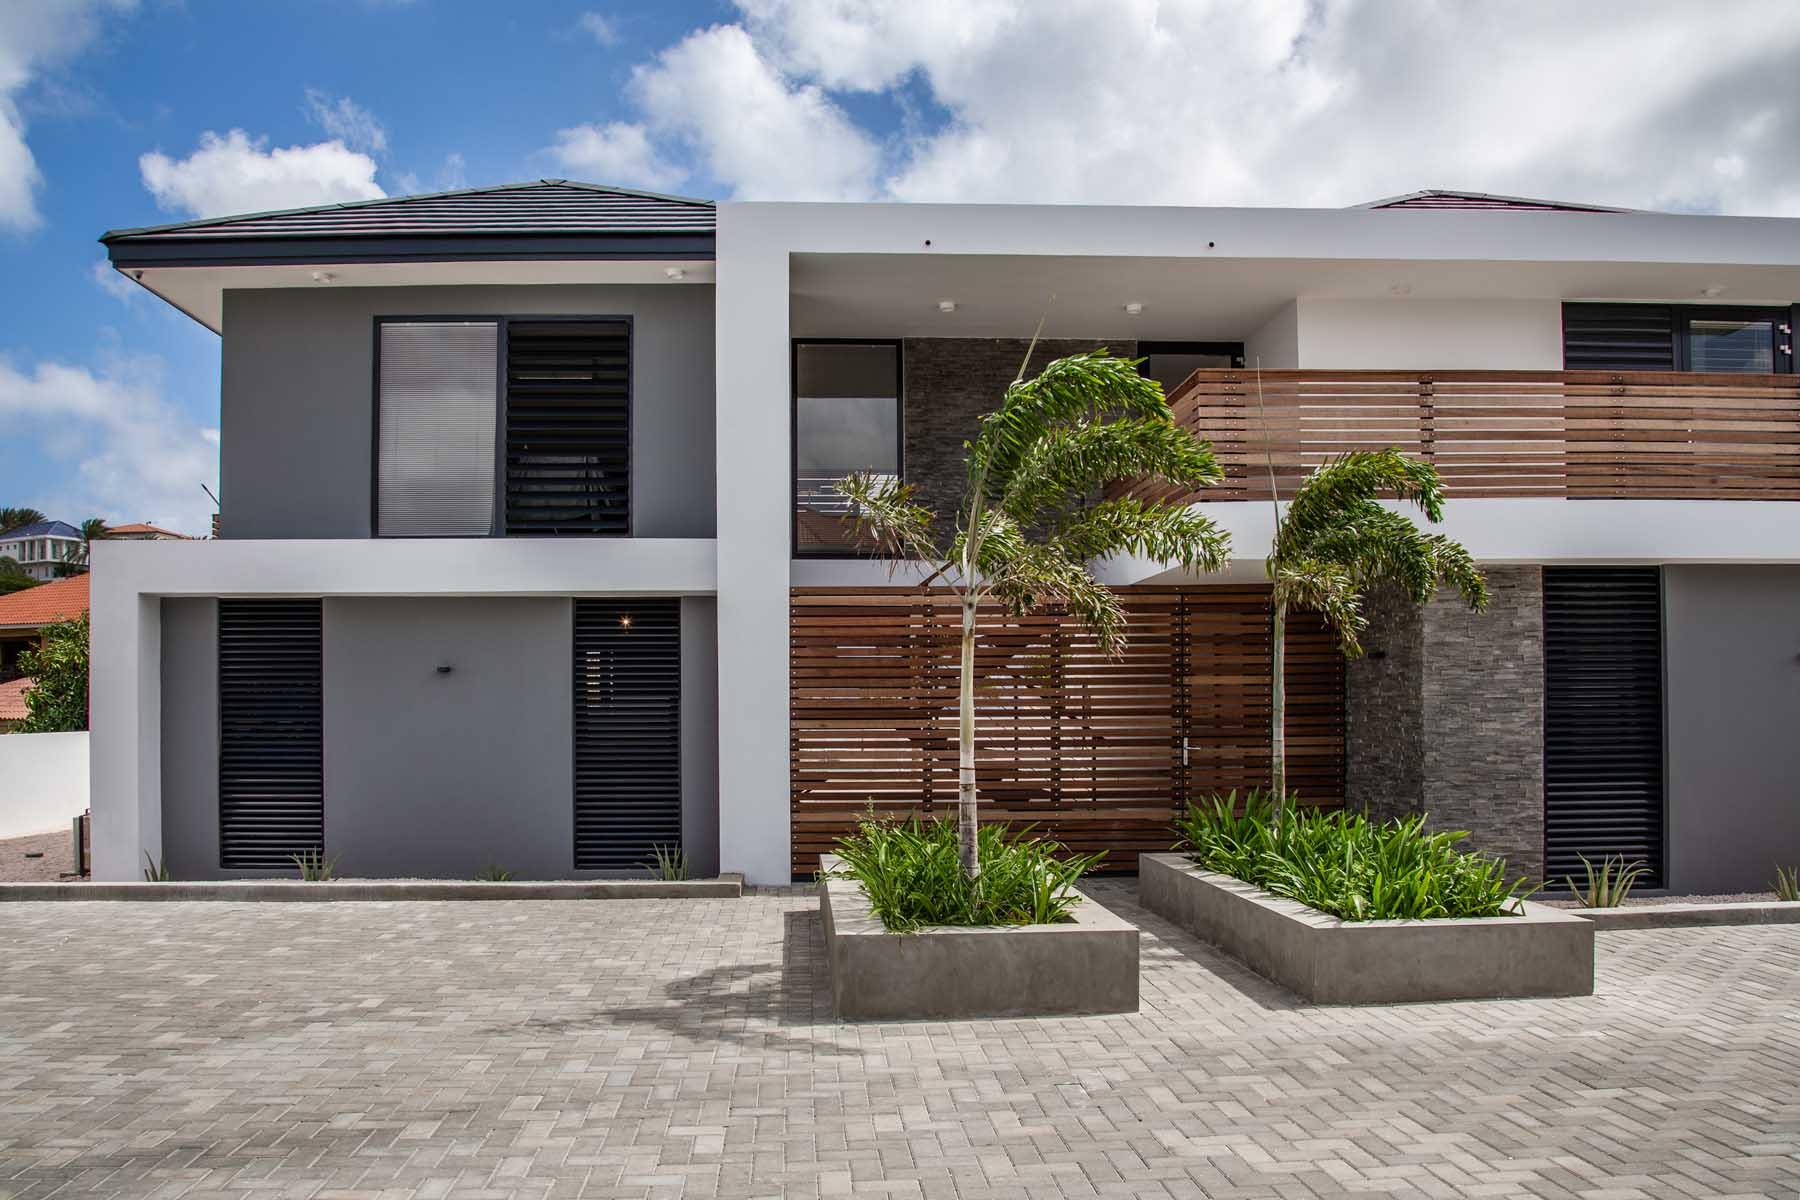 Holiday villa vista royal ihc architects nederland curaçao